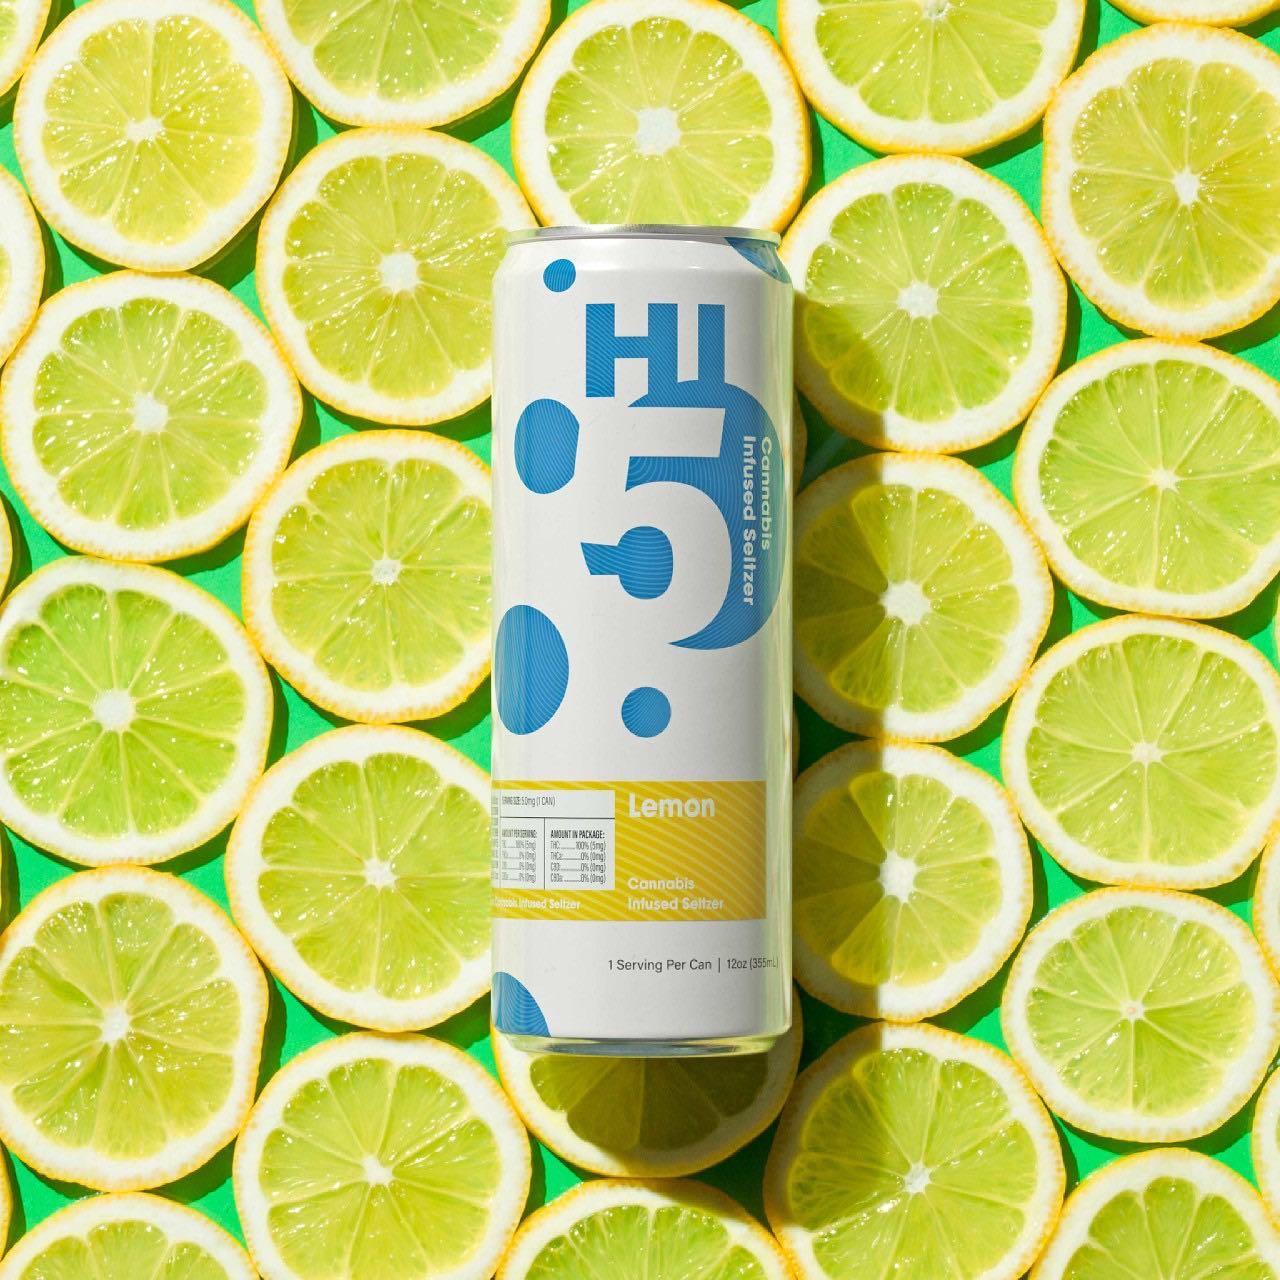 Lemon-Hi5-Infused-Seltzer